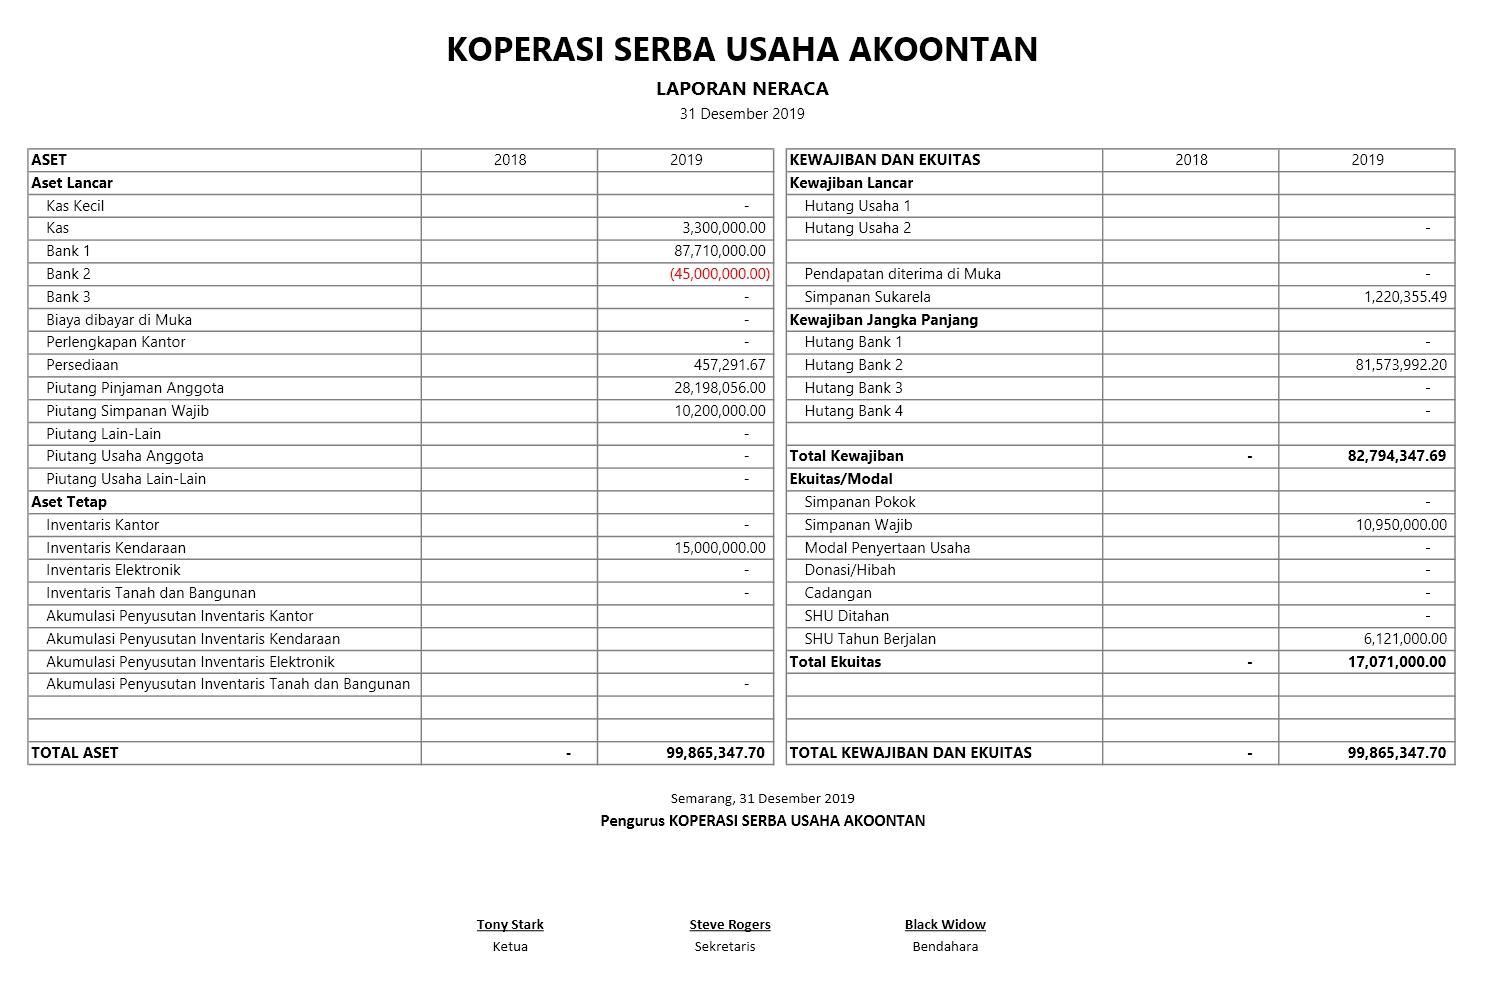 Laporan Posisi Keuangan Koperasi Serba Usaha